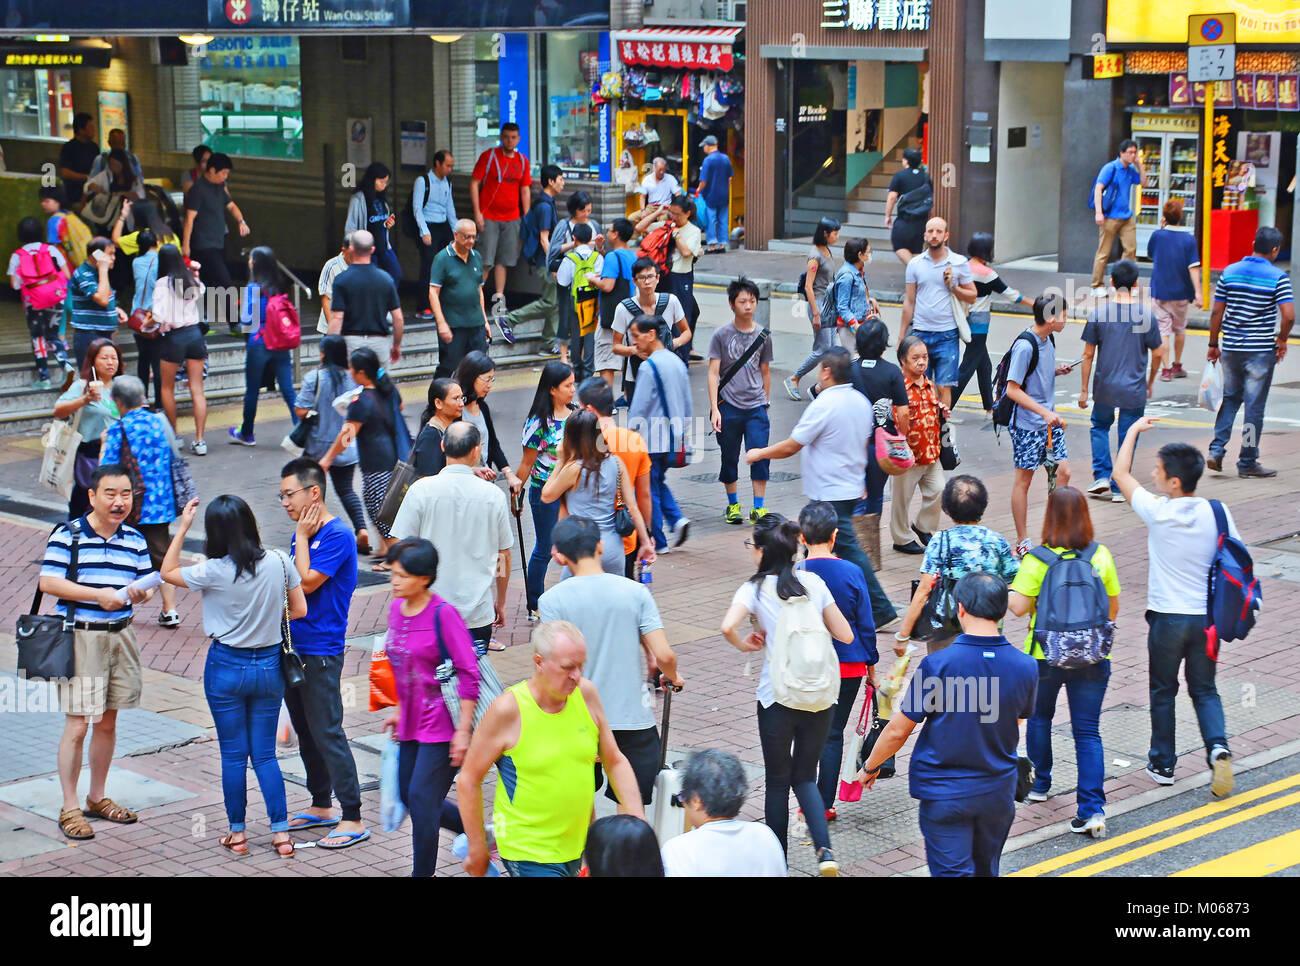 street scene Hong Kong island, China - Stock Image